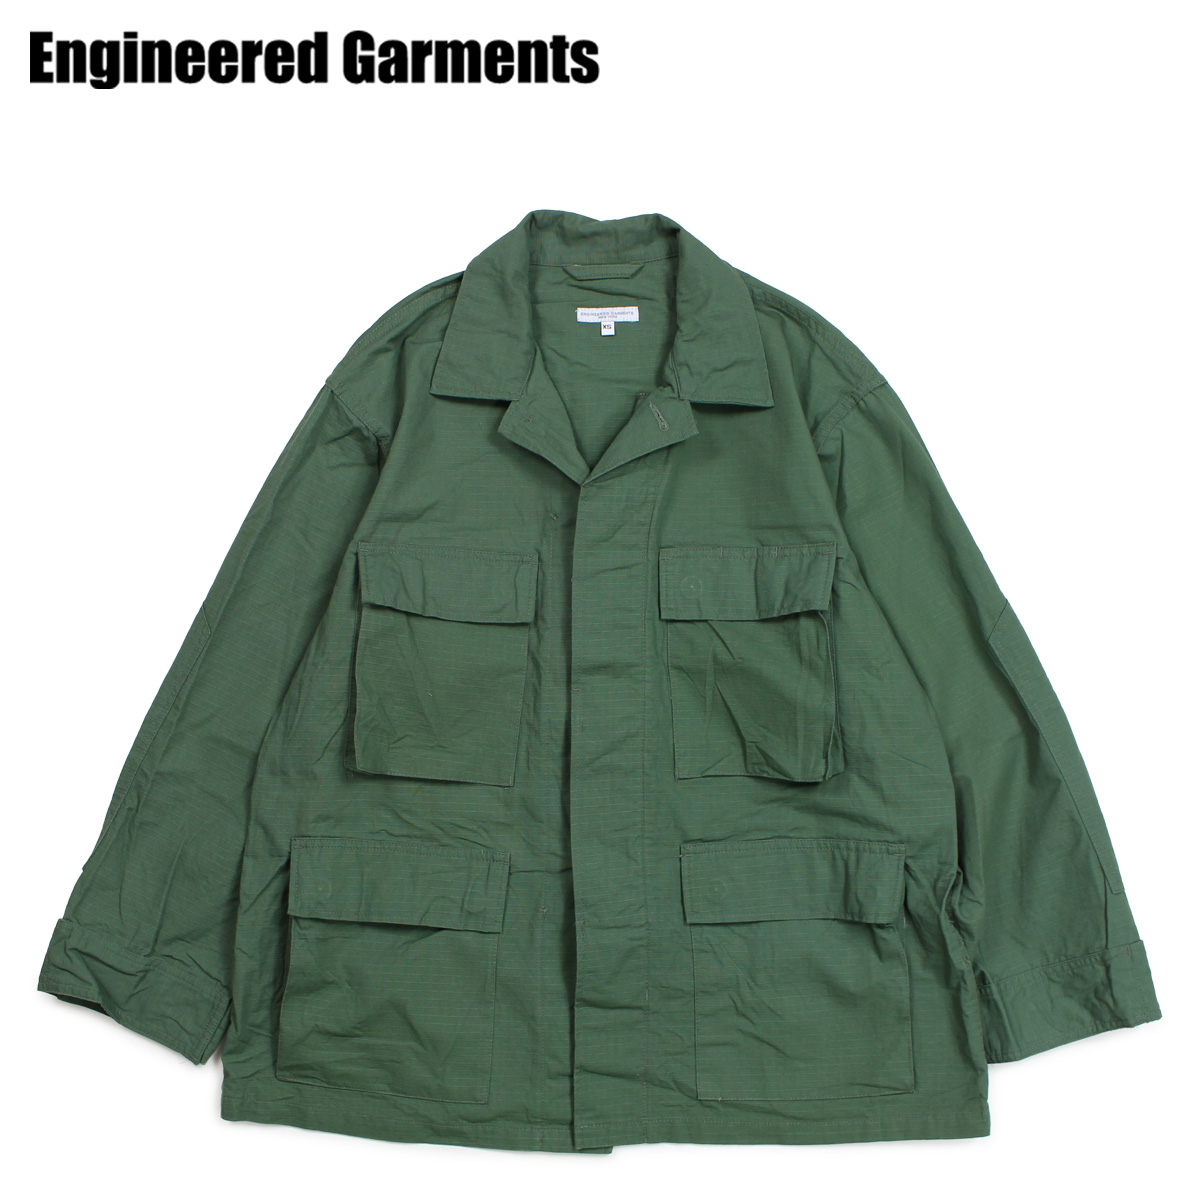 ENGINEERED GARMENTS エンジニアドガーメンツ ジャケット ミリタリージャケット メンズ BDU JACKET オリーブ 19SD002 [3/28 新入荷]